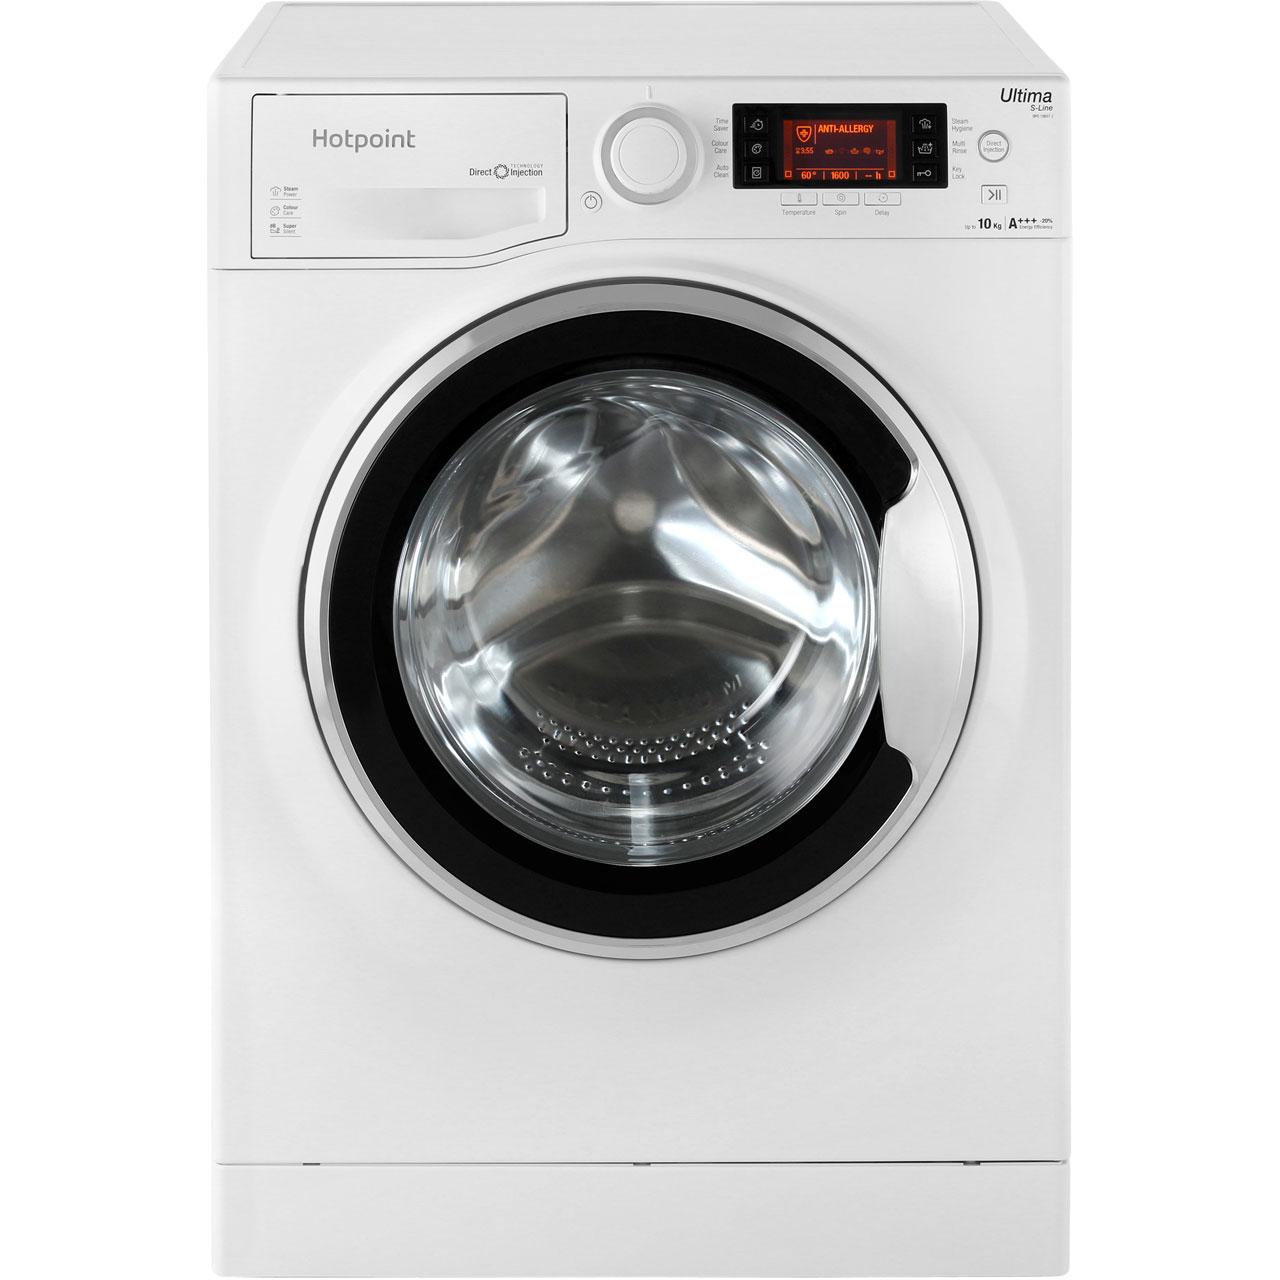 Hotpoint Ultima SLine RPD10657JX Free Standing Washing Machine in White  Chrome